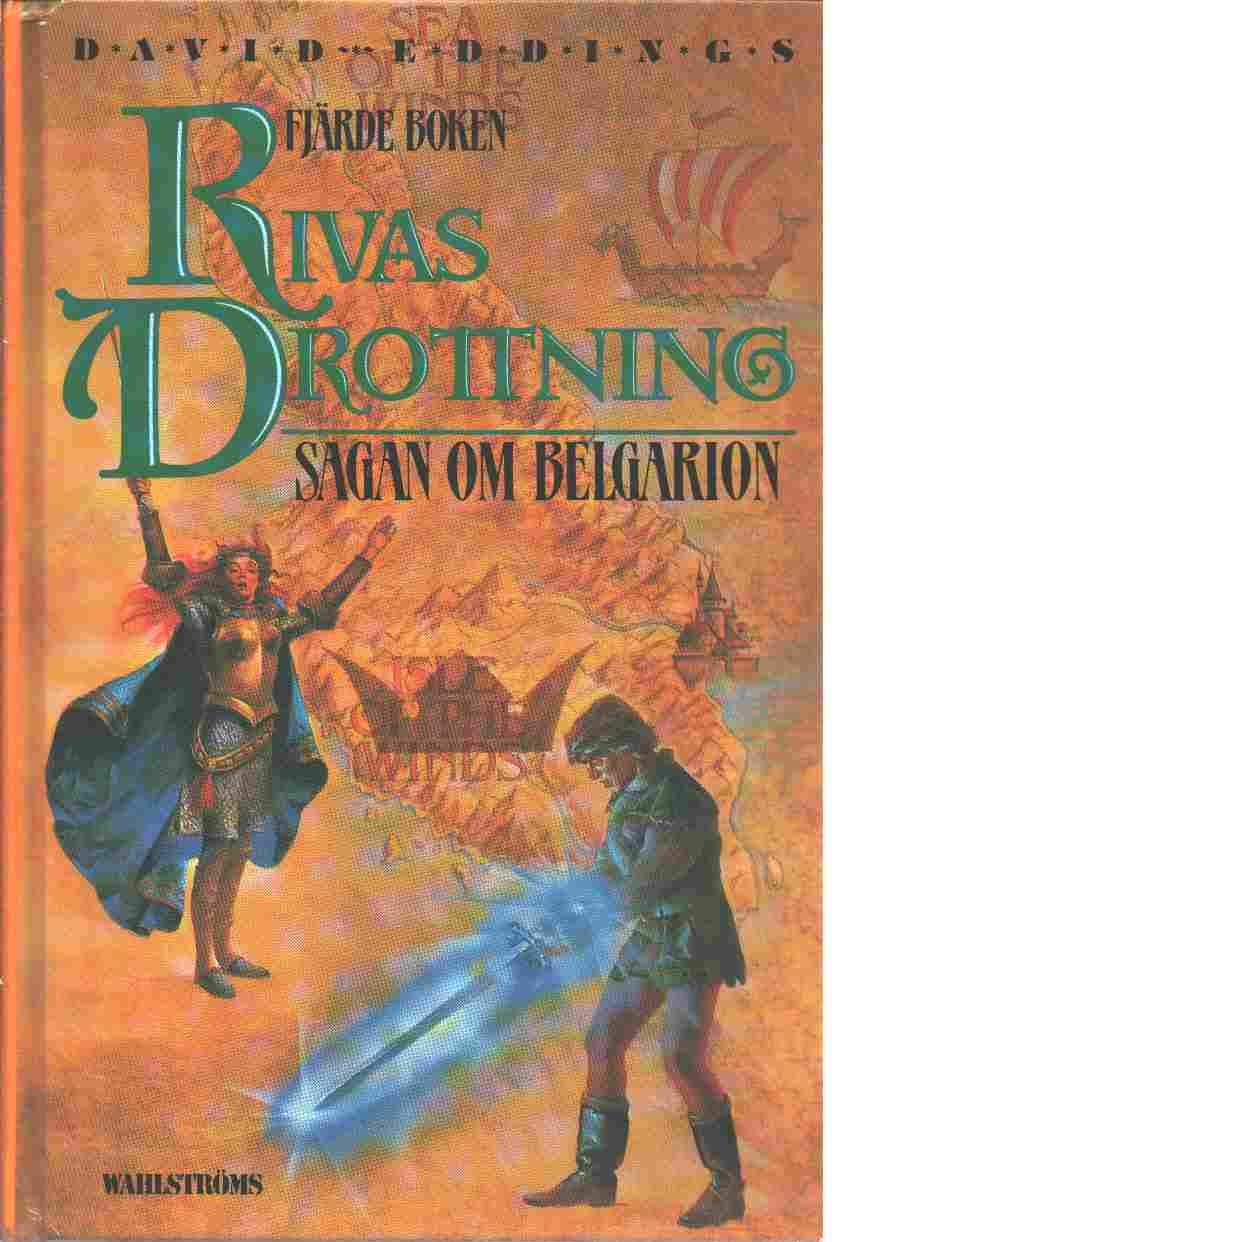 Sagan om Belgarion. Bok 4, Rivas drottning - Eddings, David